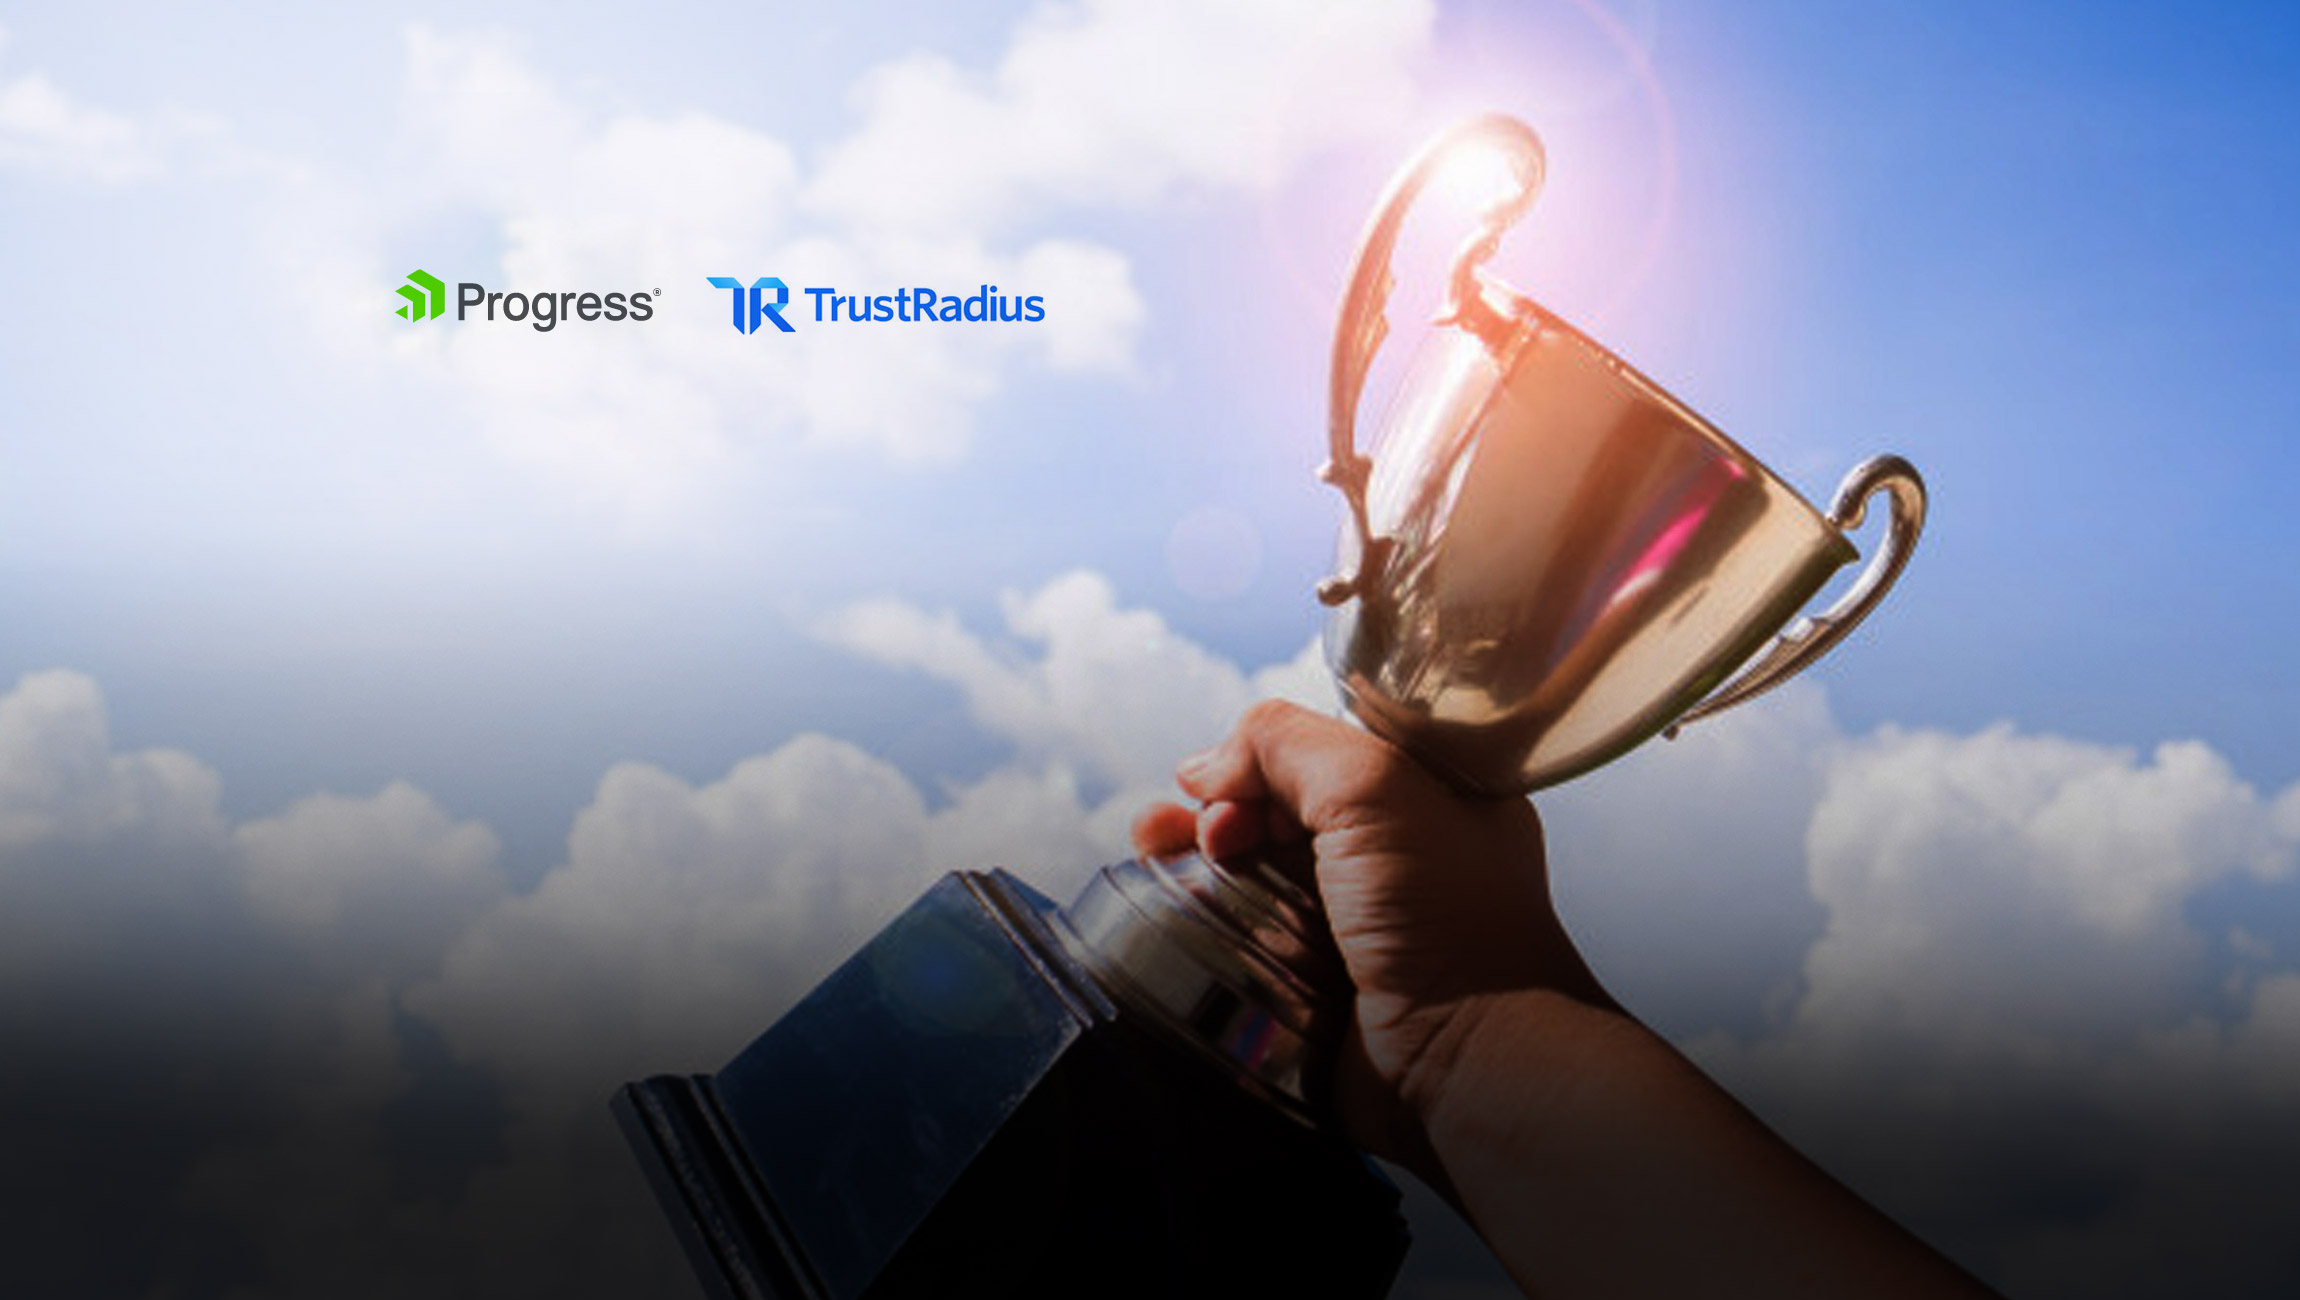 Progress-Wins-2021-TrustRadius-Awards-for-Software-Components